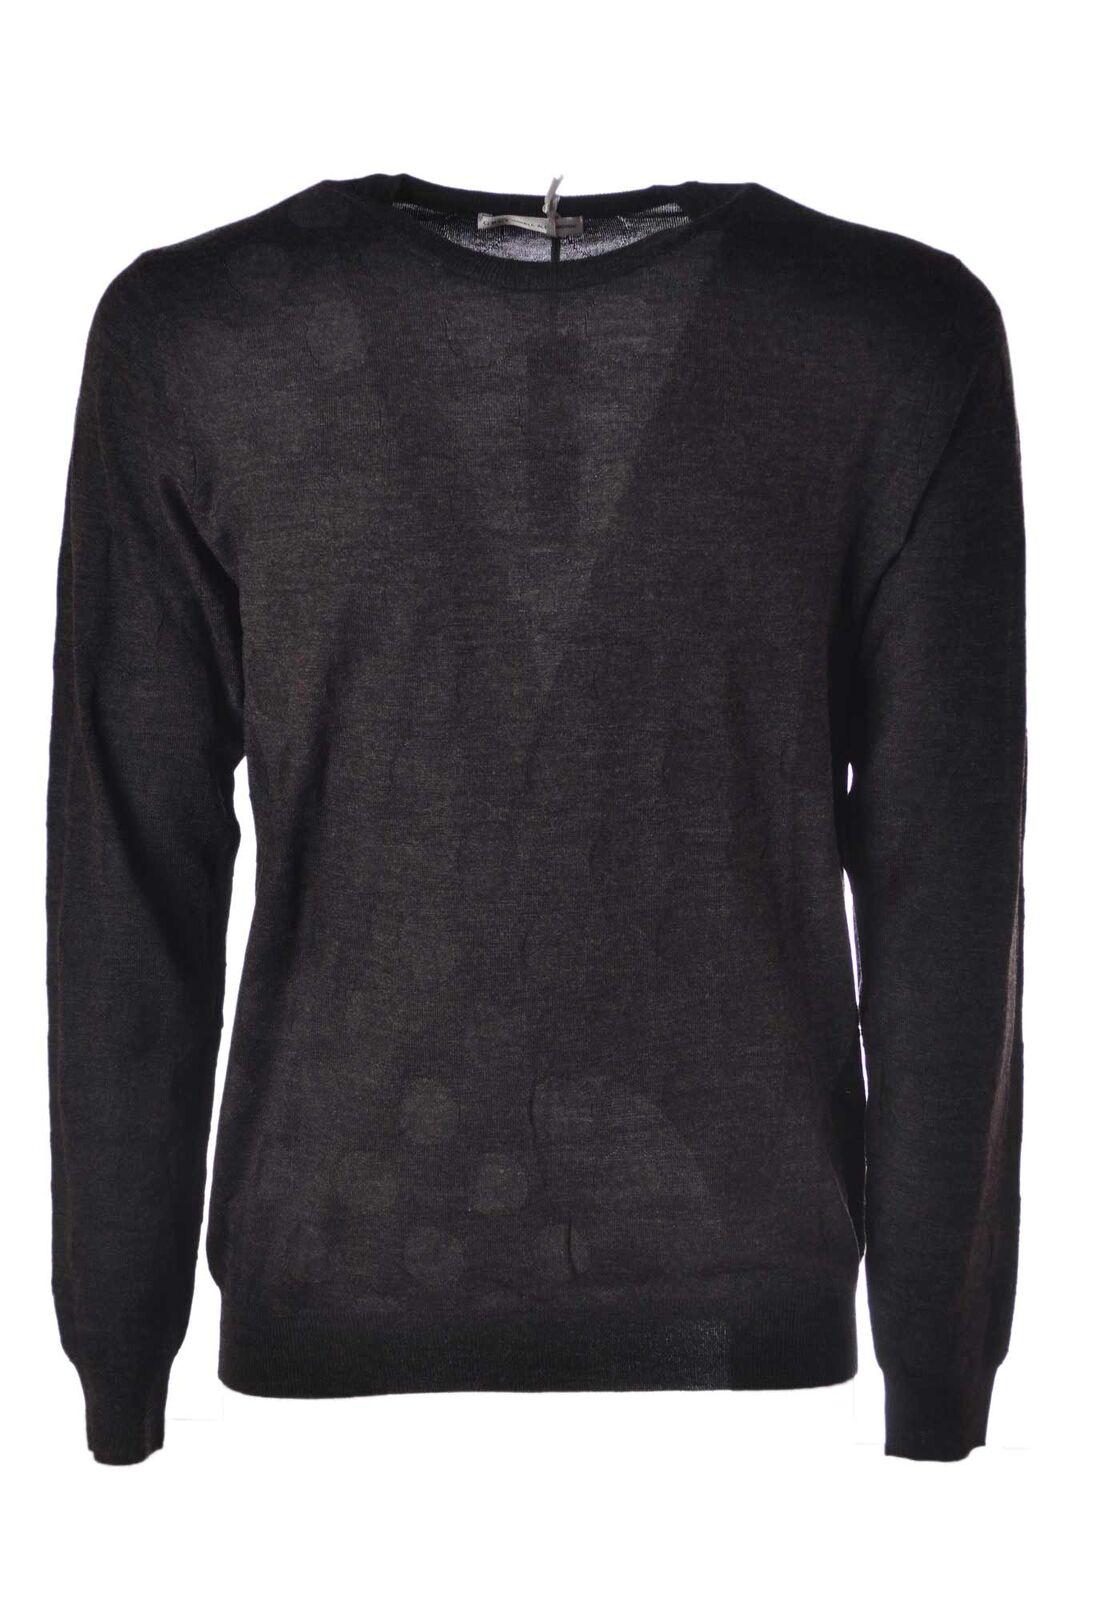 Daniele Alessandrini  -  Sweaters - Male - Grau - 4384112A184630